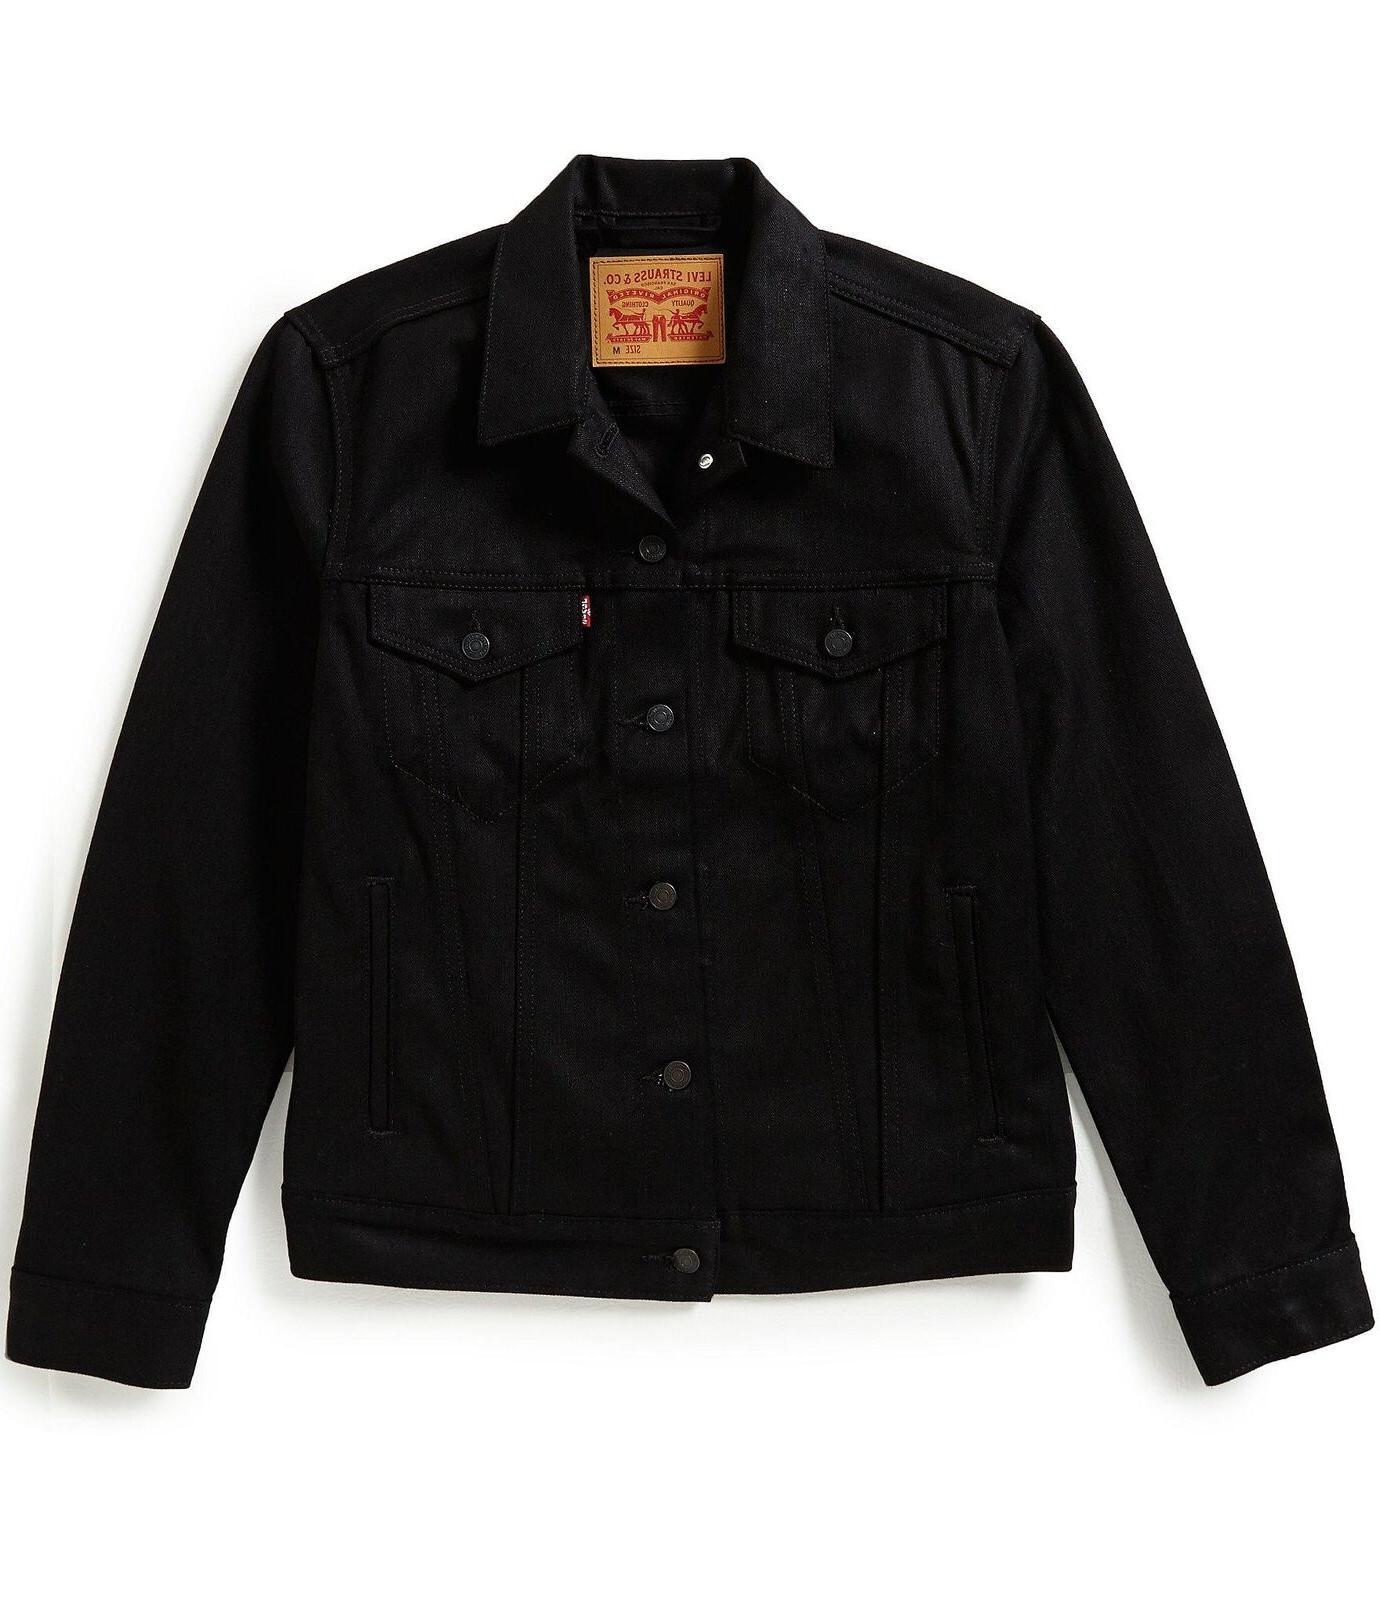 New Levi's Trucker Classic -Polished Black